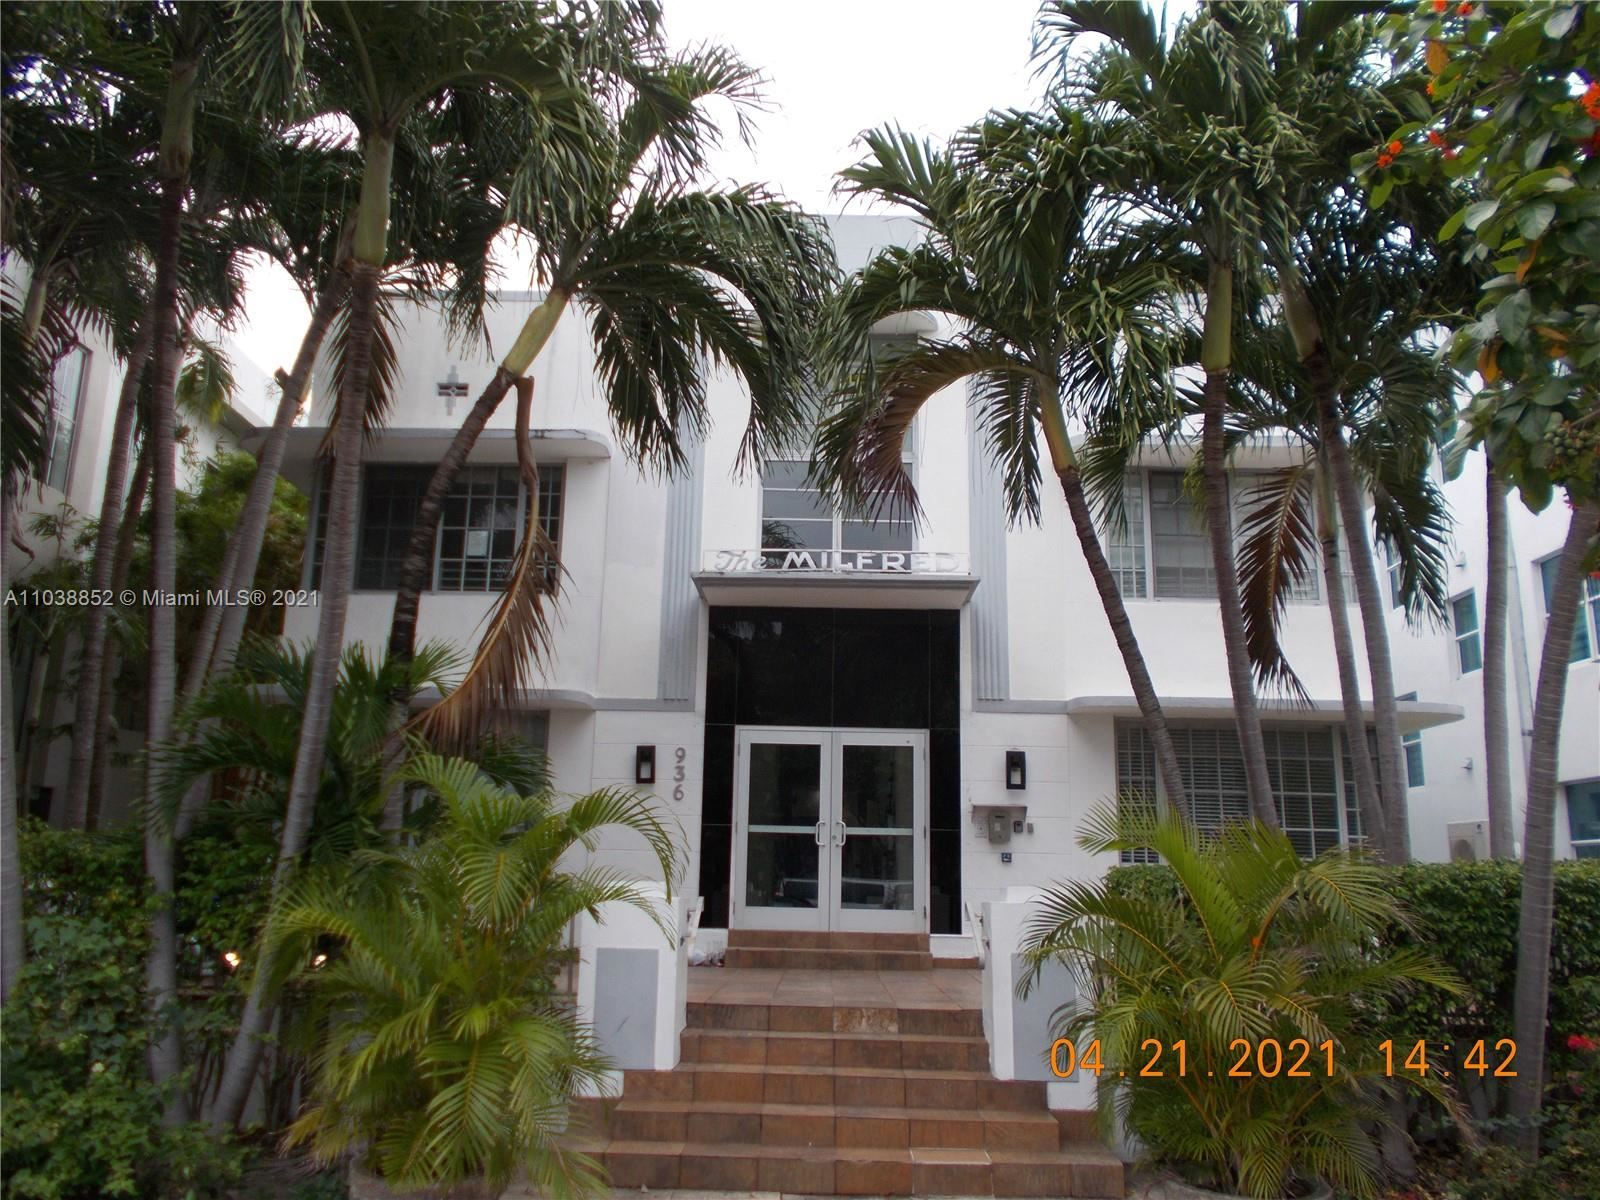 Photo of 936 Pennsylvania Ave #101, Miami Beach, FL 33139 (MLS # A11038852)